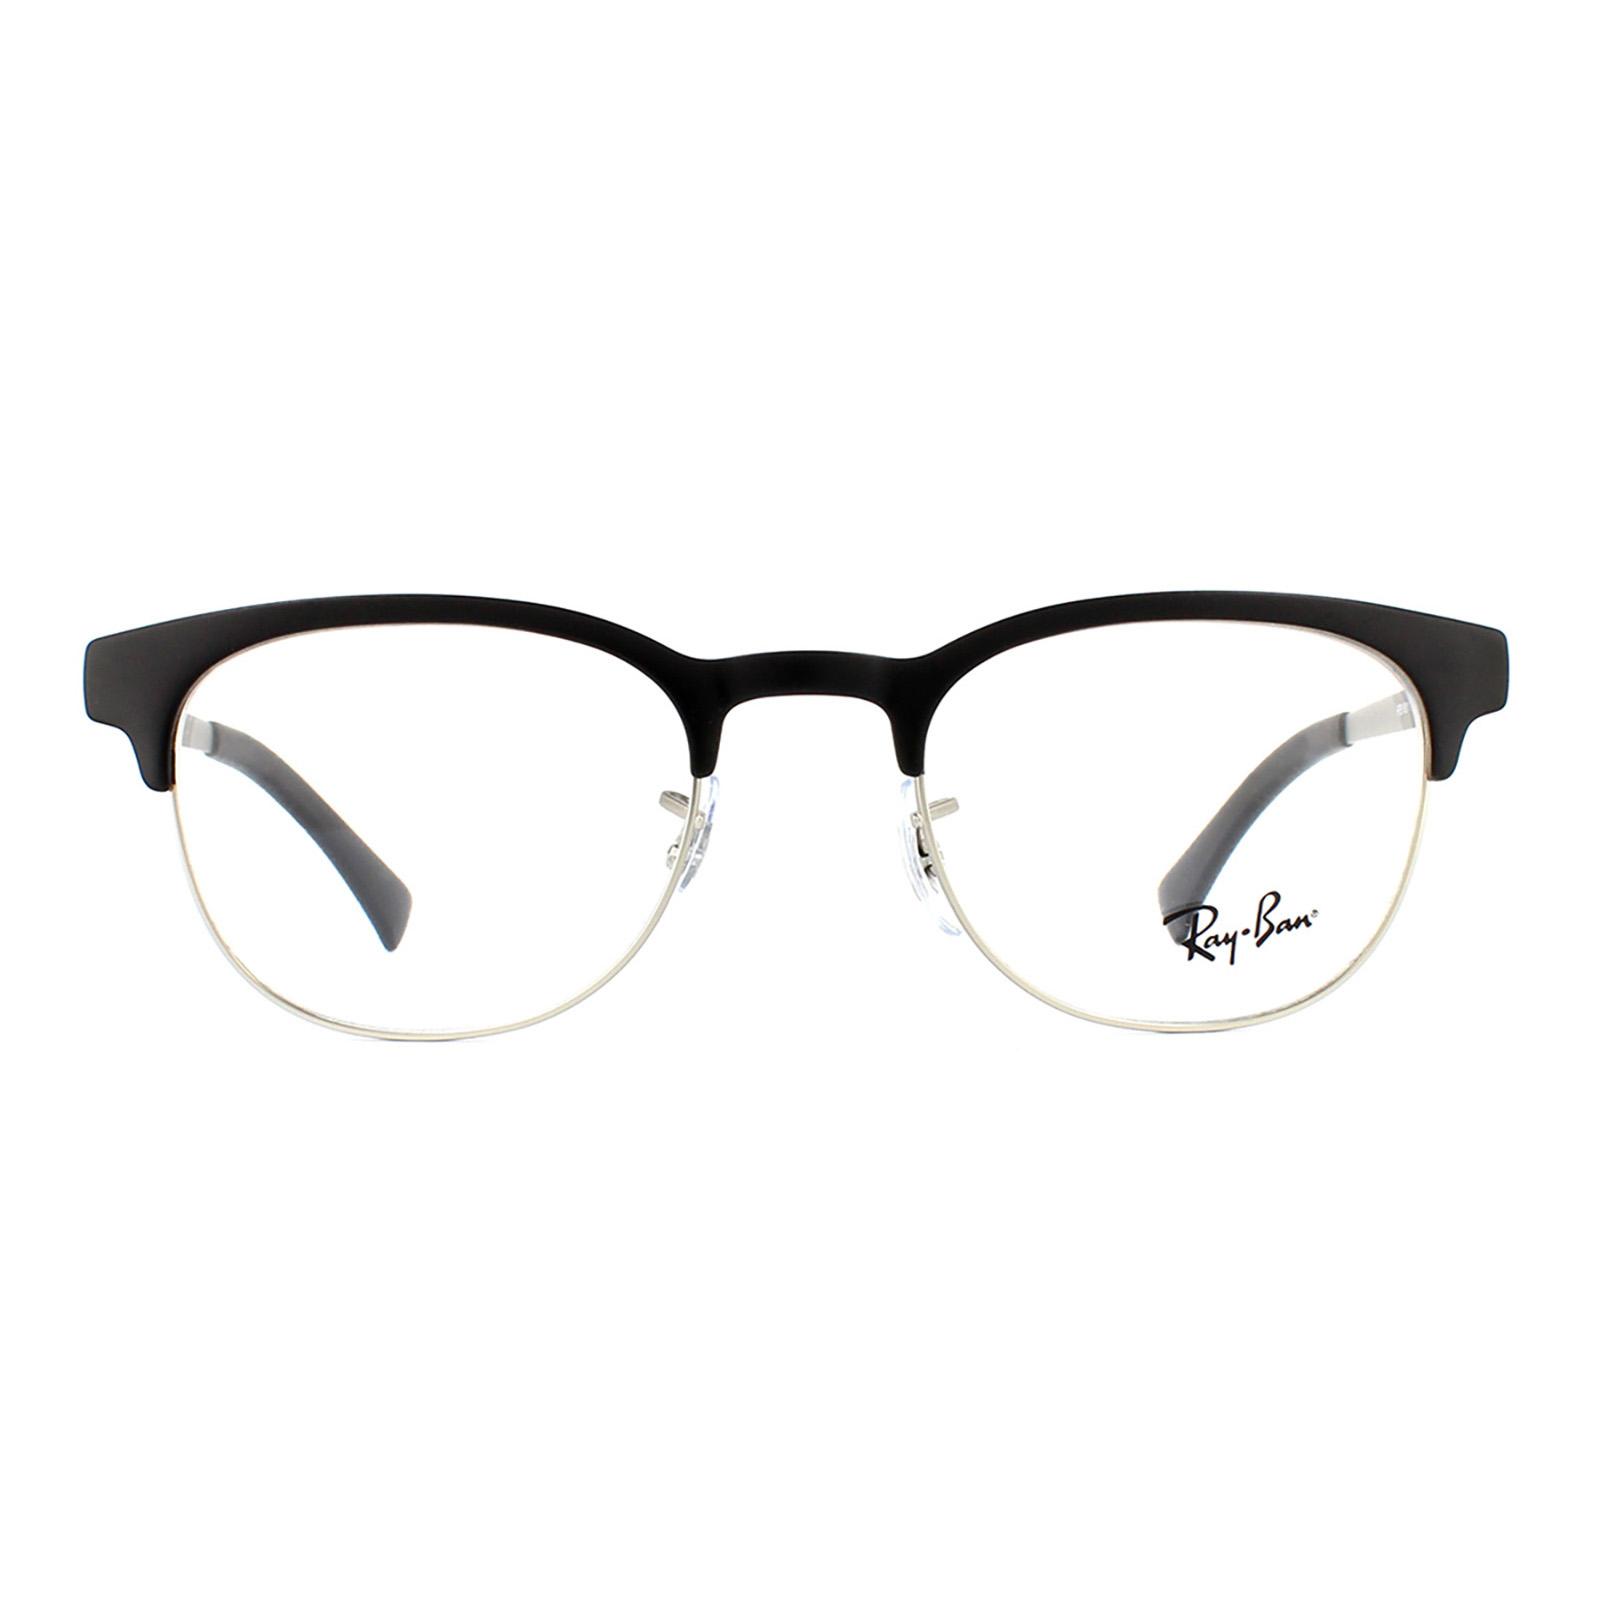 Ray-Ban Glasses Frames 6317 2832 Top Black On Matte Silver ...